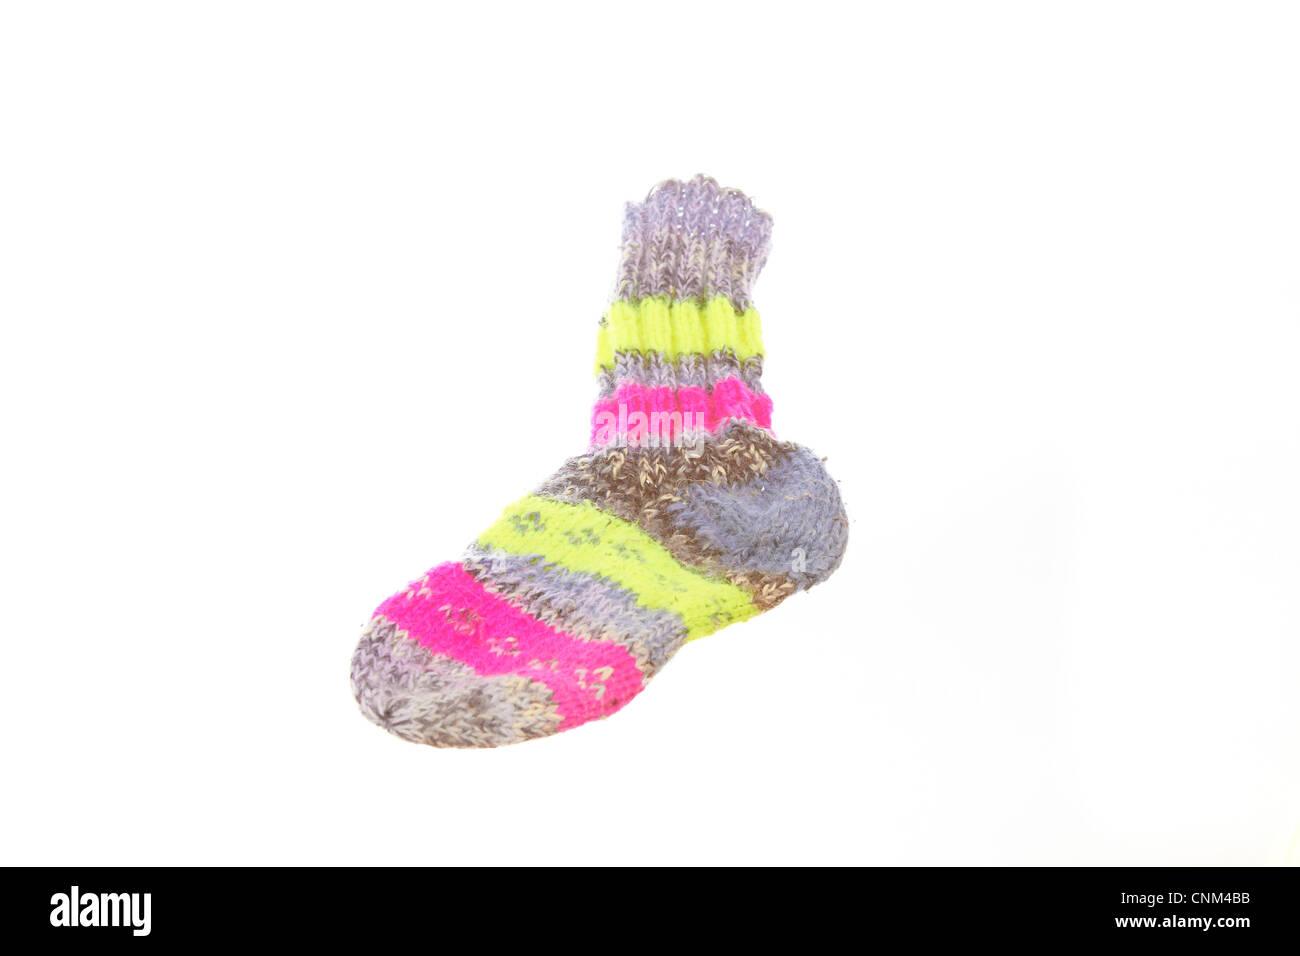 Gestrickte Socken in verschiedenen Farben Stockfoto